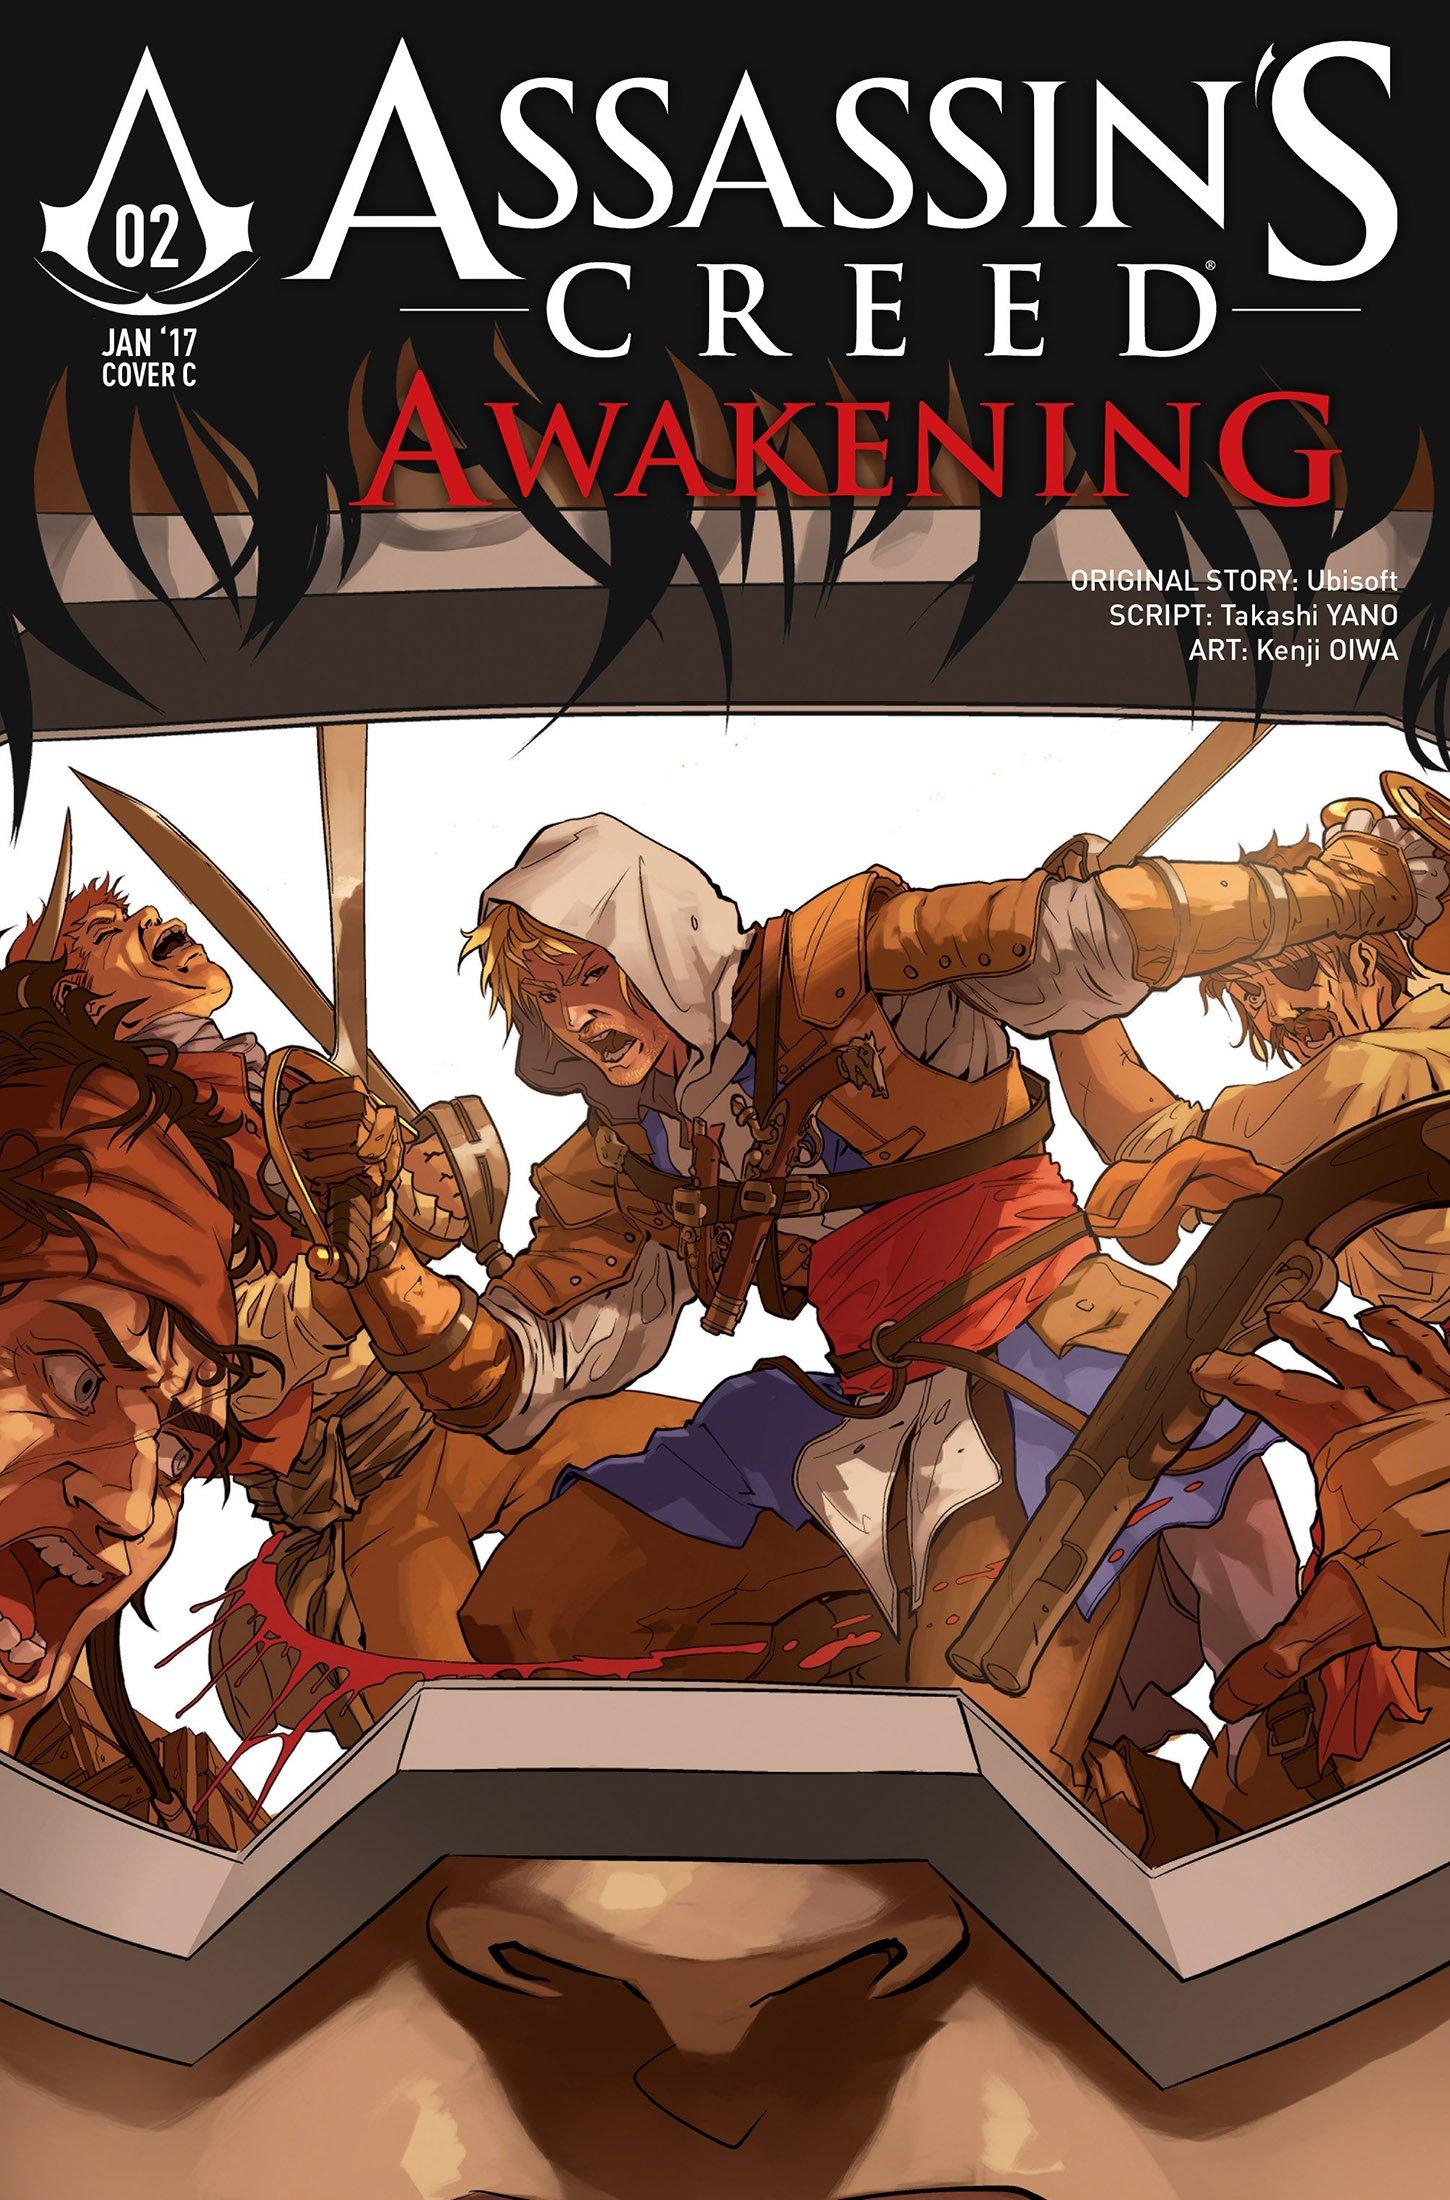 Assassin's Creed - Awakening 02 (January 2017) (cover c)